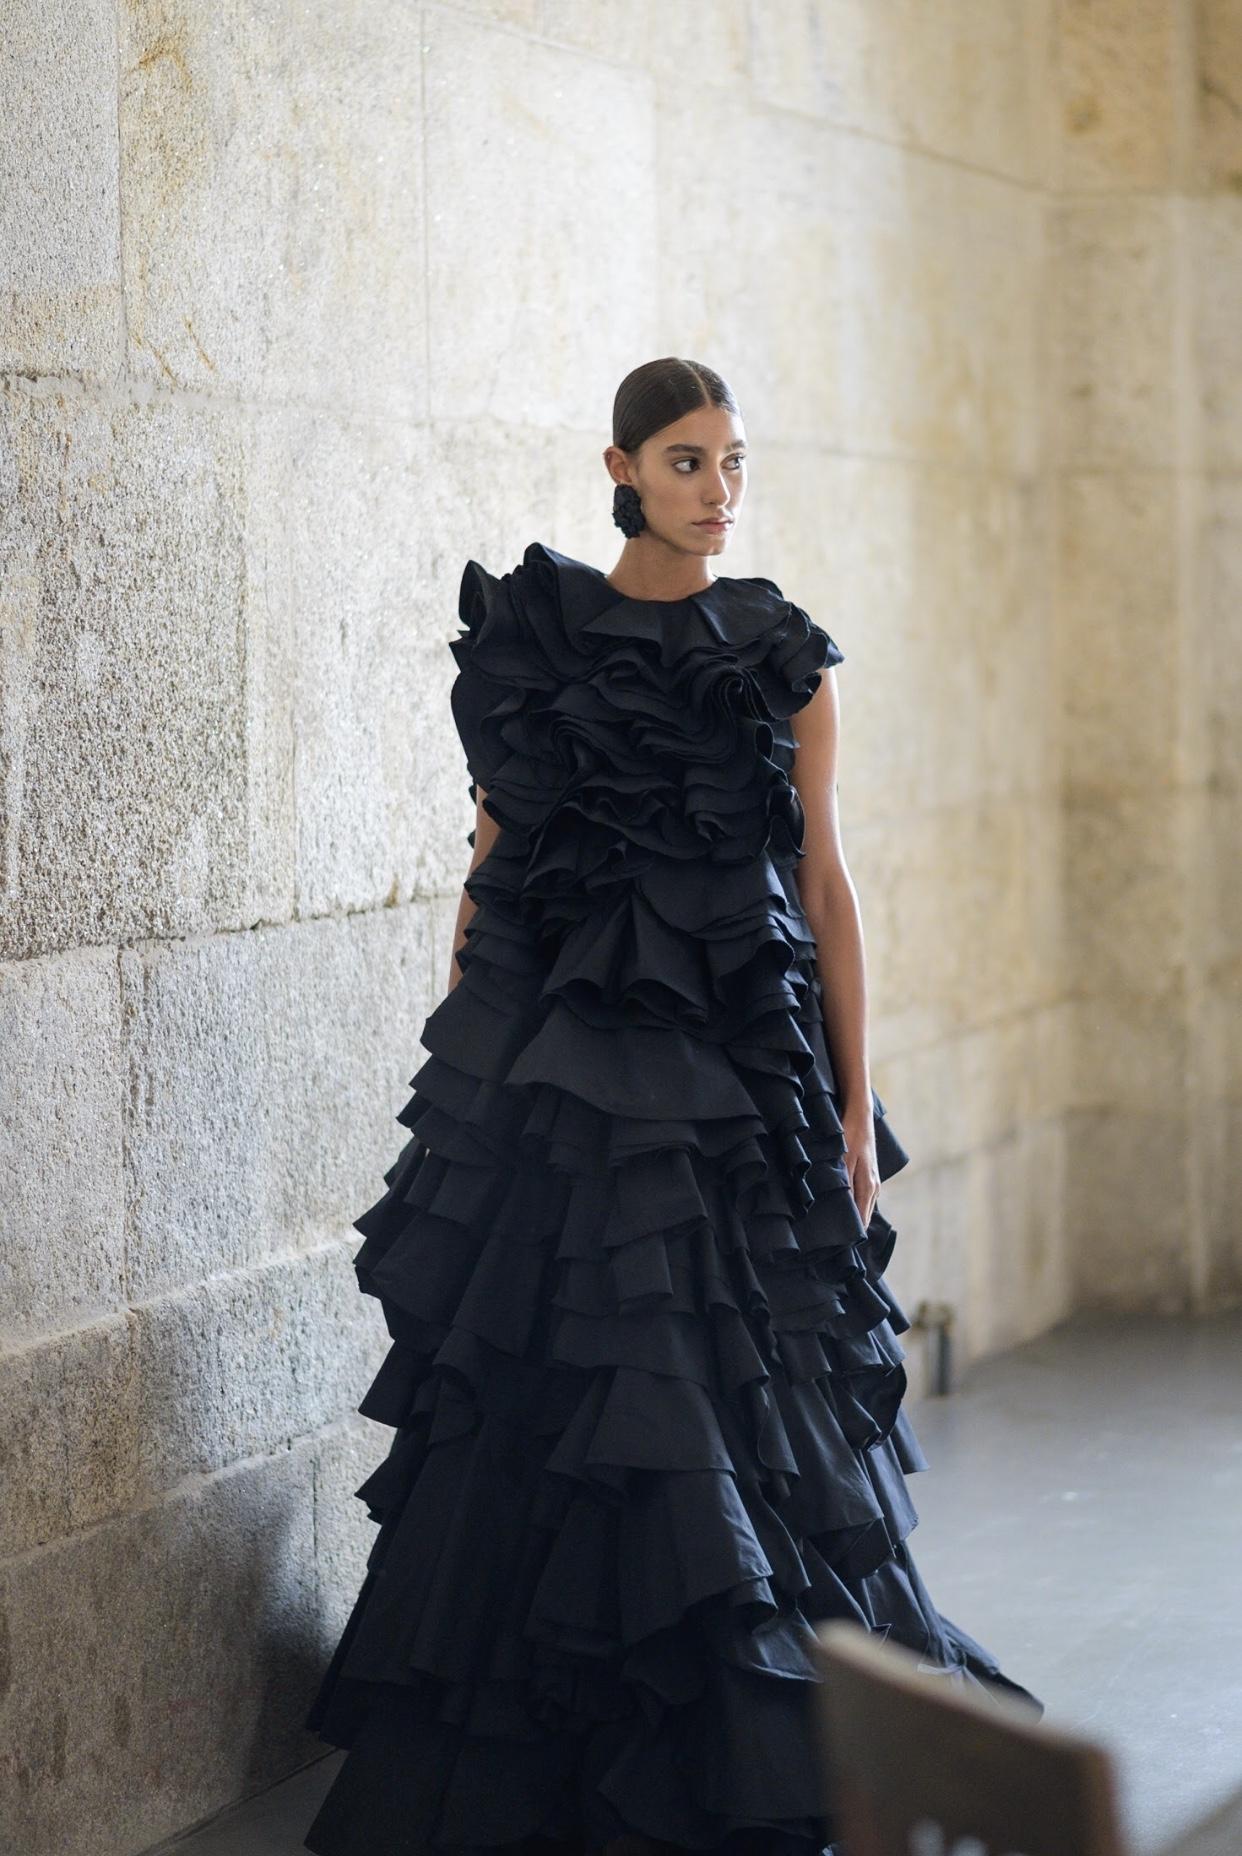 Luís Alejandro González Bisanti new young emerging fashion designers portugal